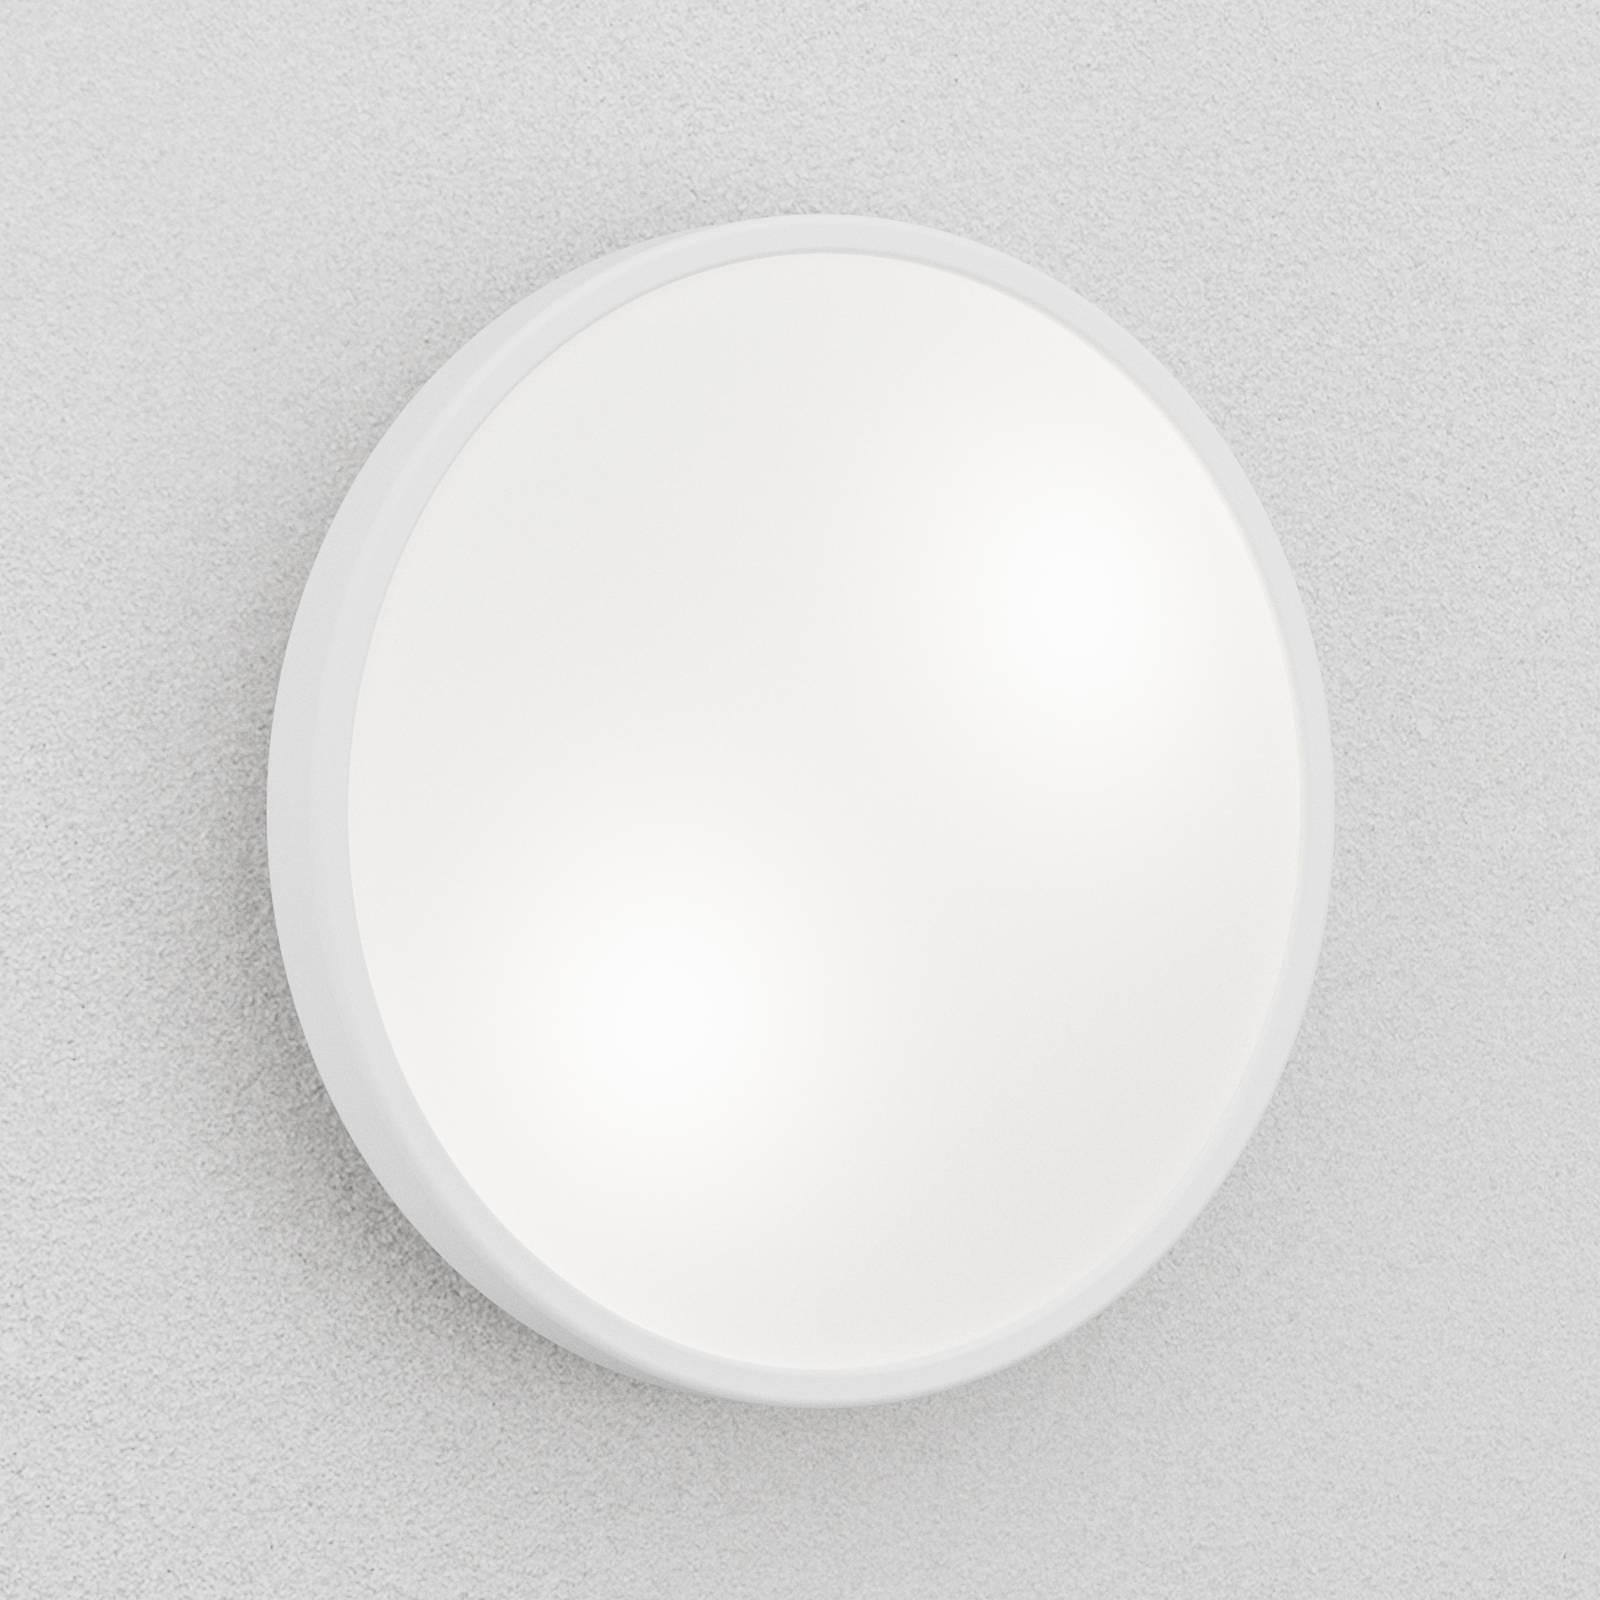 PLAZA plafondlamp en wandlamp, 31 cm, wit